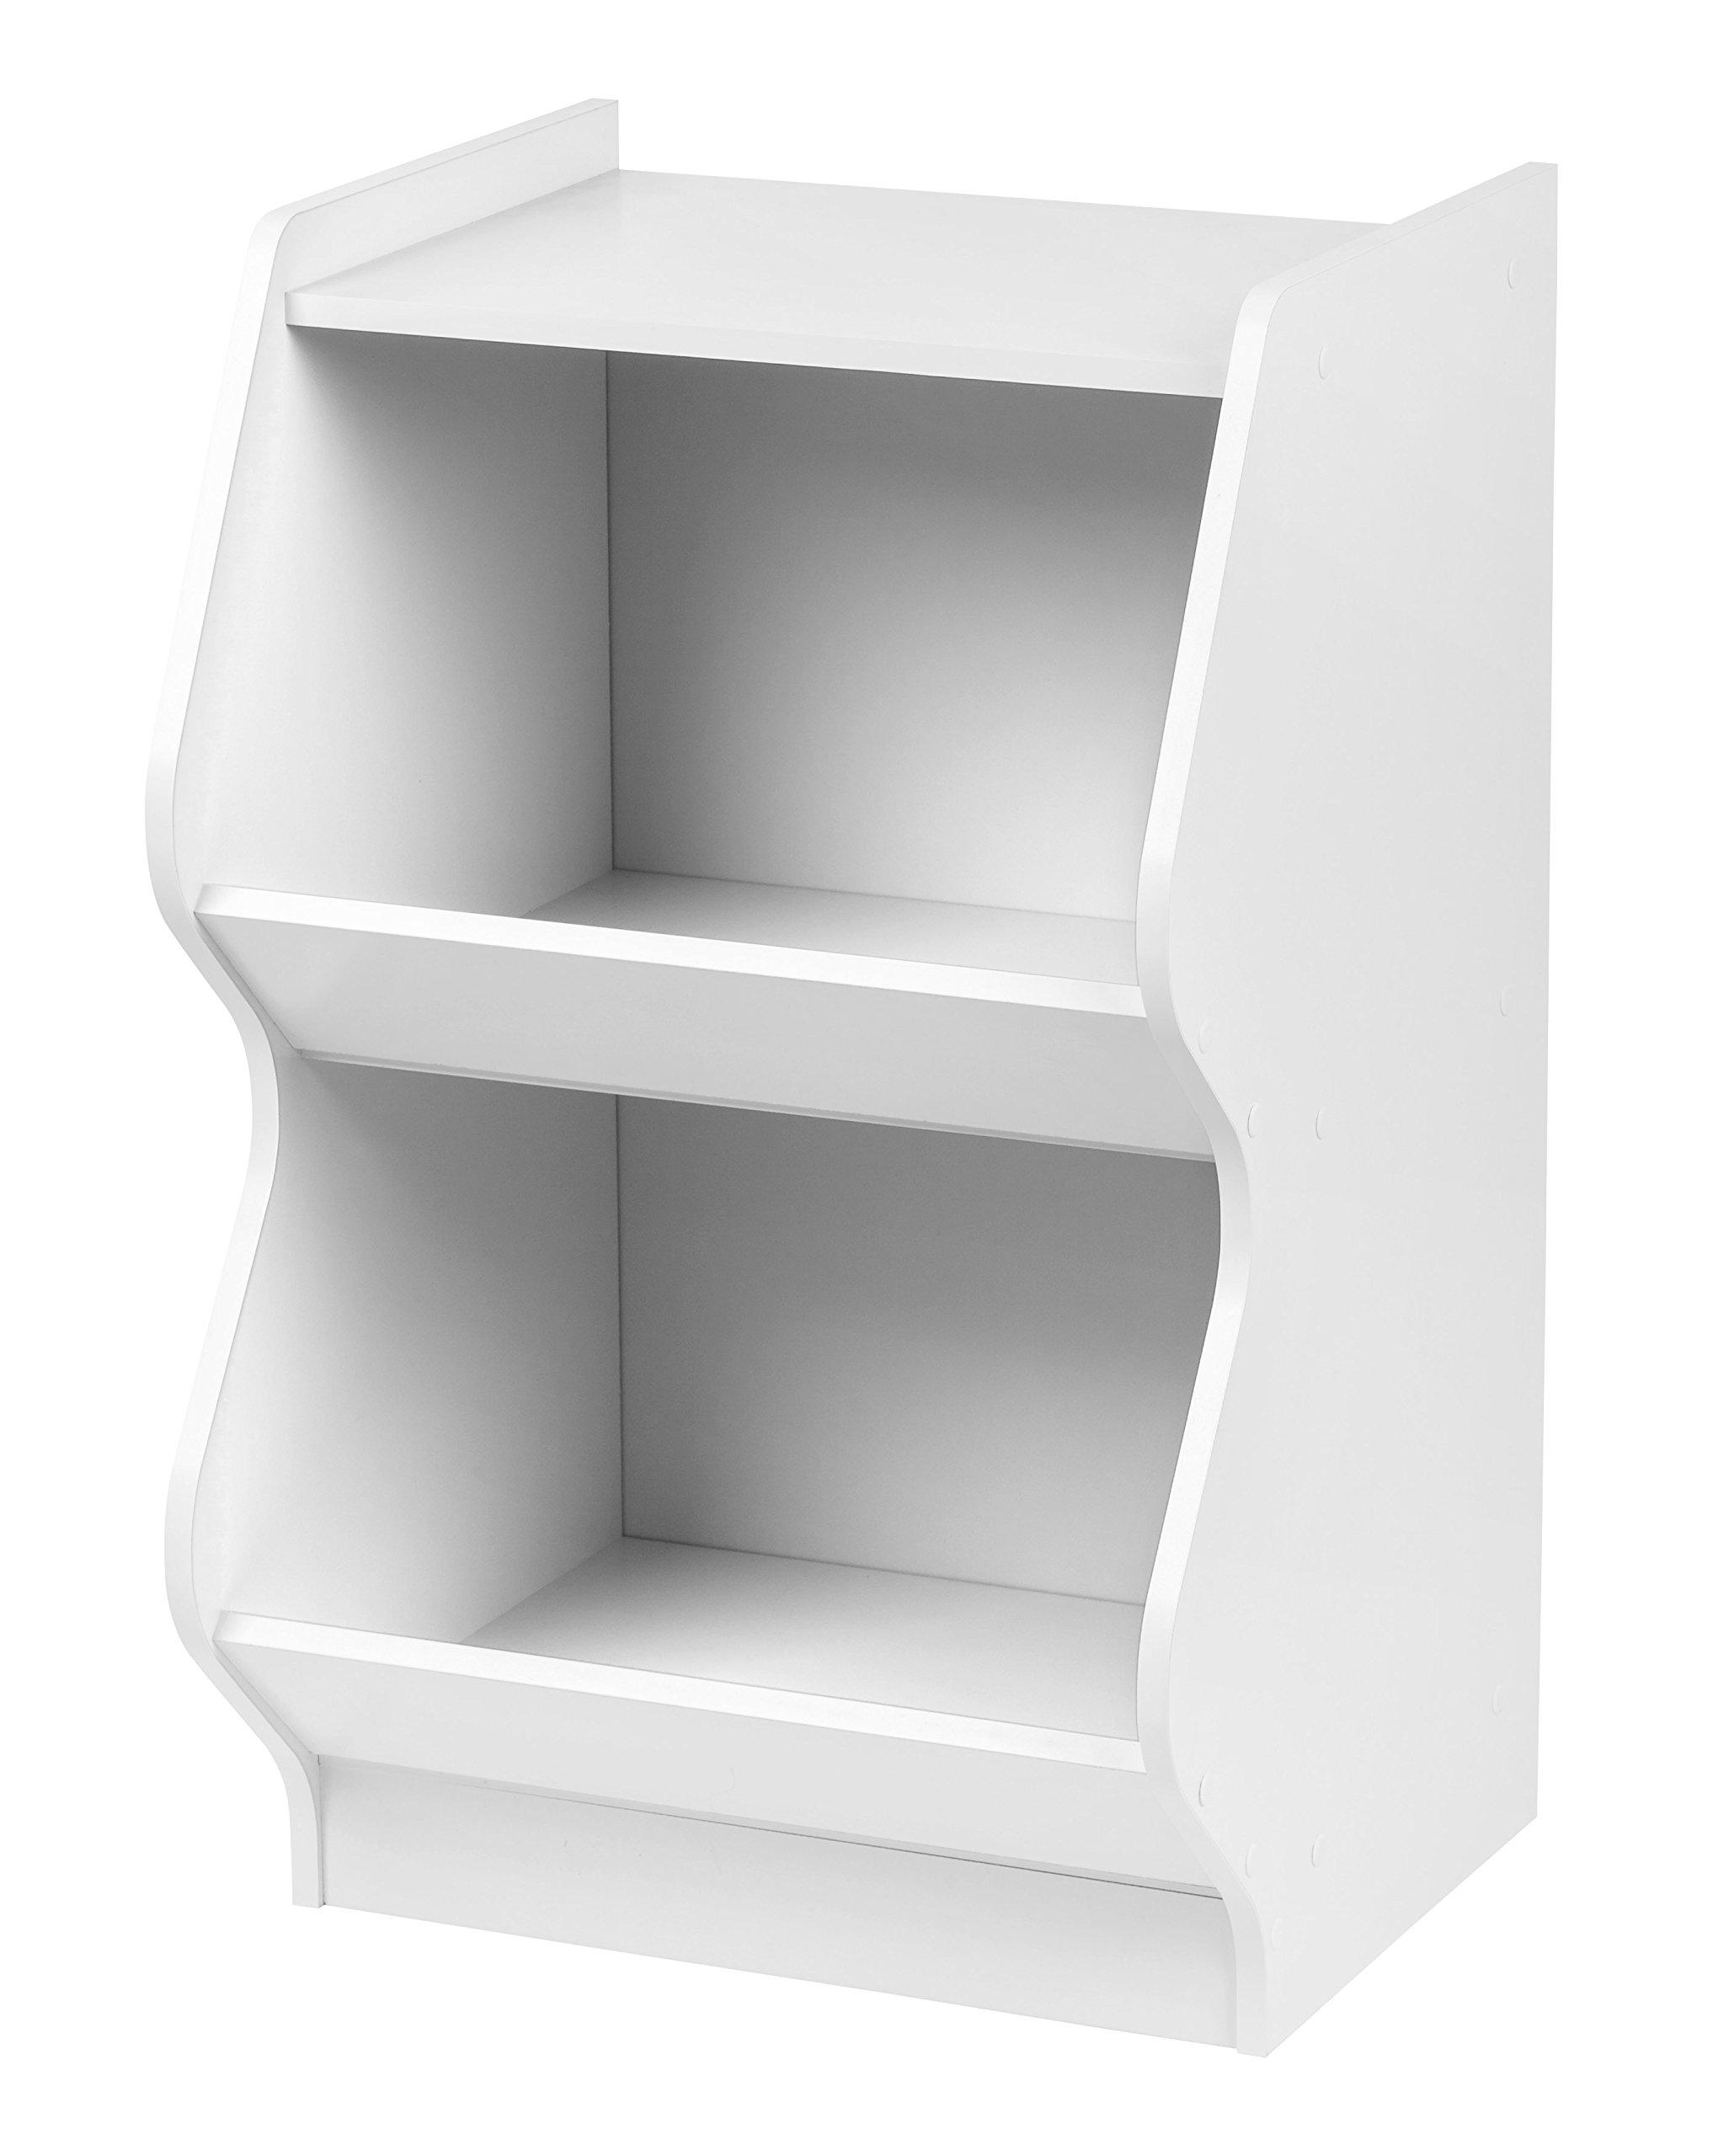 IRIS 2 Tier Curved Edge Storage Shelf, White